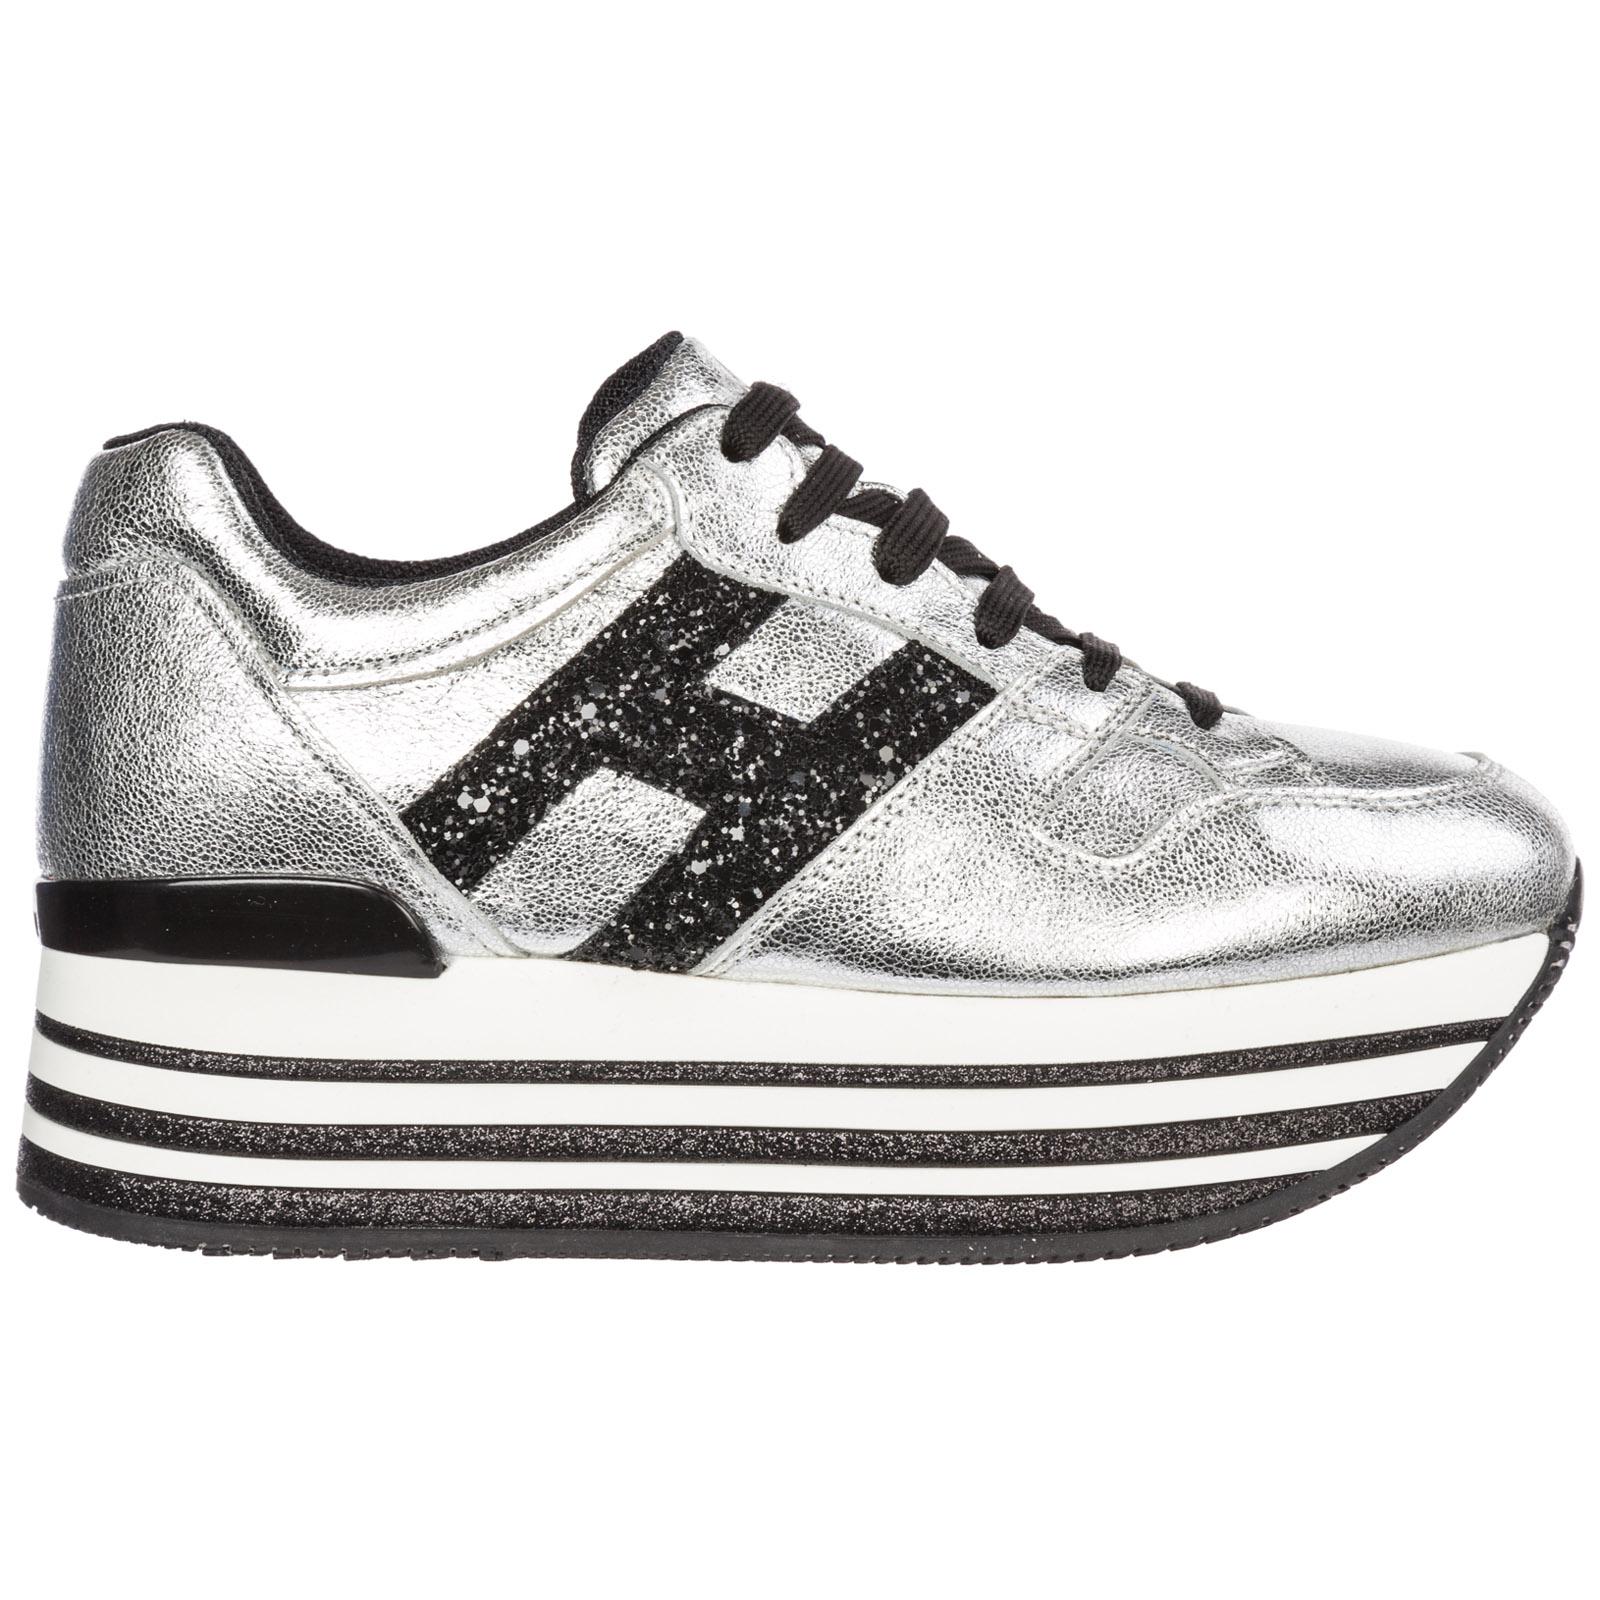 4c8b7ccc2a878 Sneakers con zeppa Hogan Maxi H222 HXW3680T548JHD1920 argento nero ...